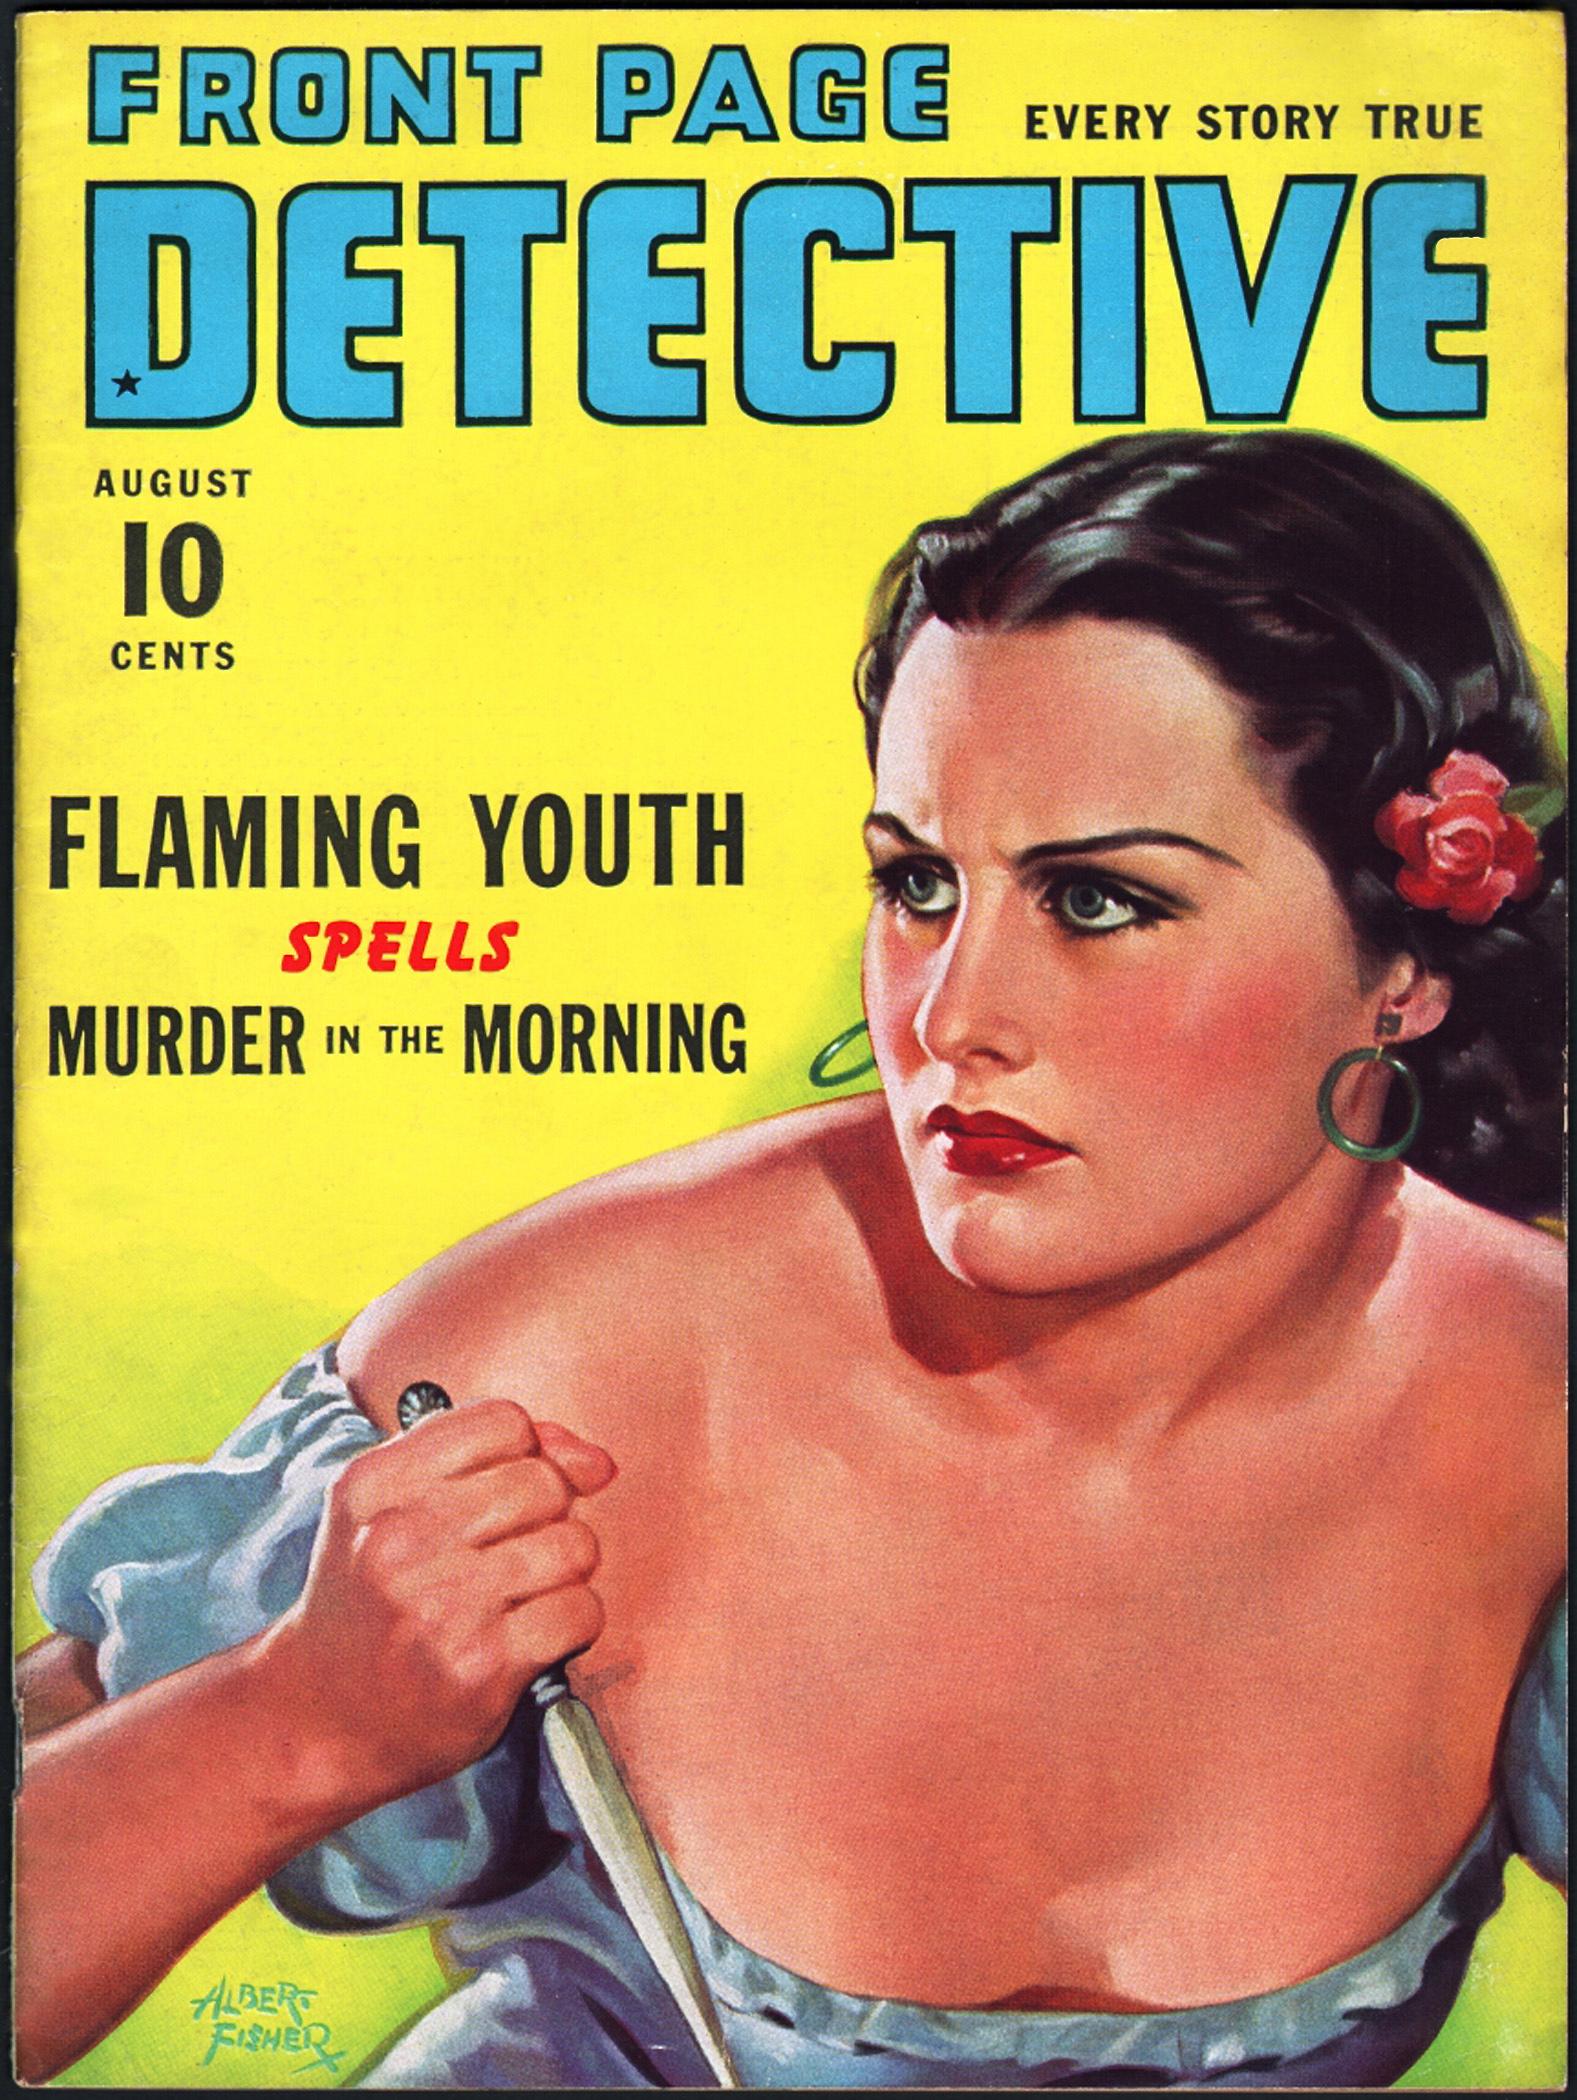 Bianca Manalo (b. 1987),Kenneth More (1914?982) XXX archive Frankie Rayder USA 4 1999-2000, 2002-2003,Casey Wilson